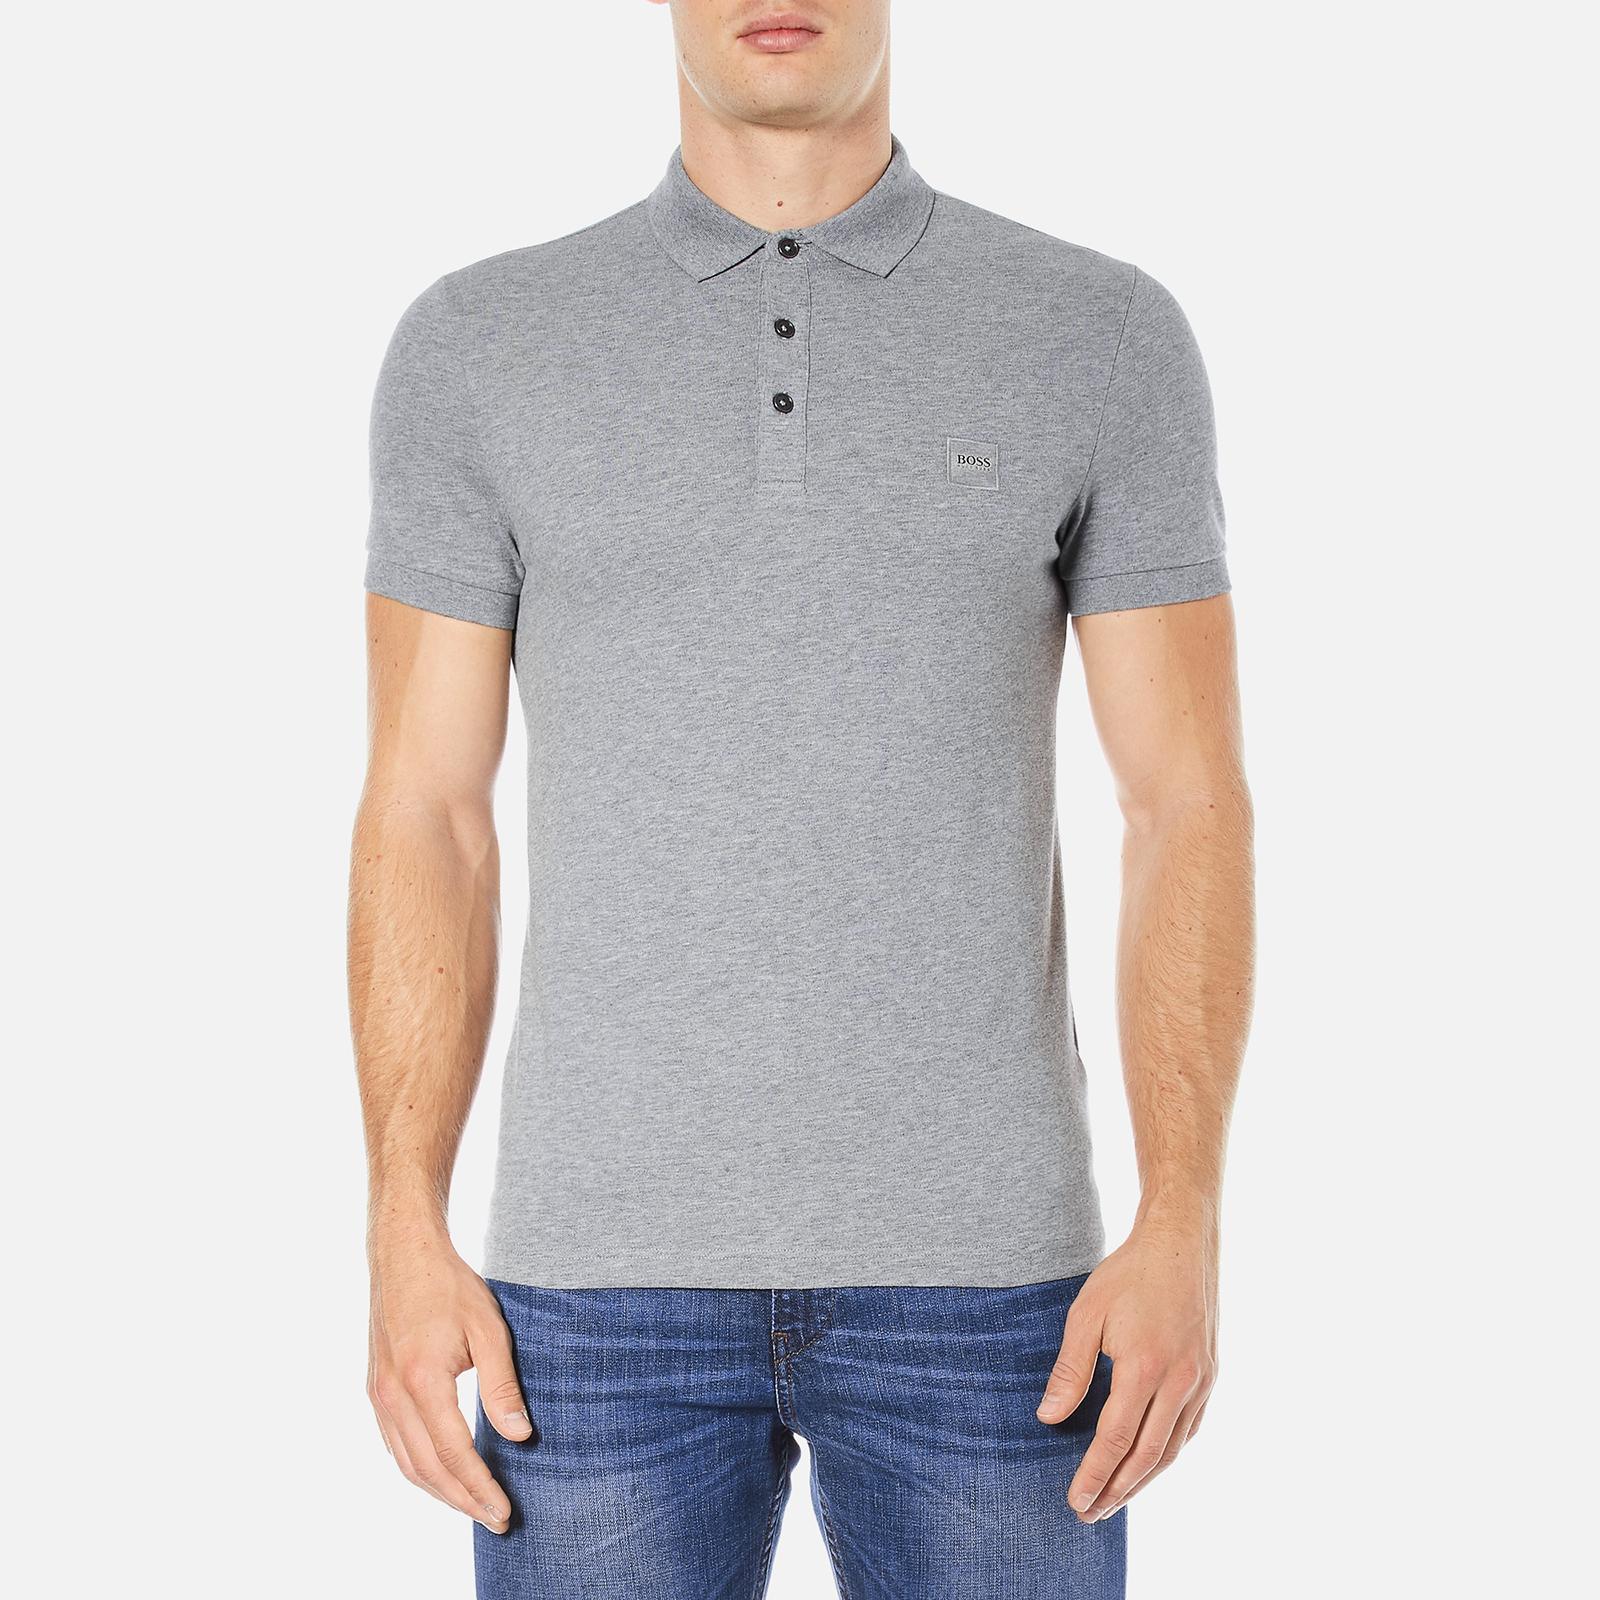 2a8d5abe9 BOSS Orange Men's Pavlik Polo Shirt - Grey - Free UK Delivery over £50